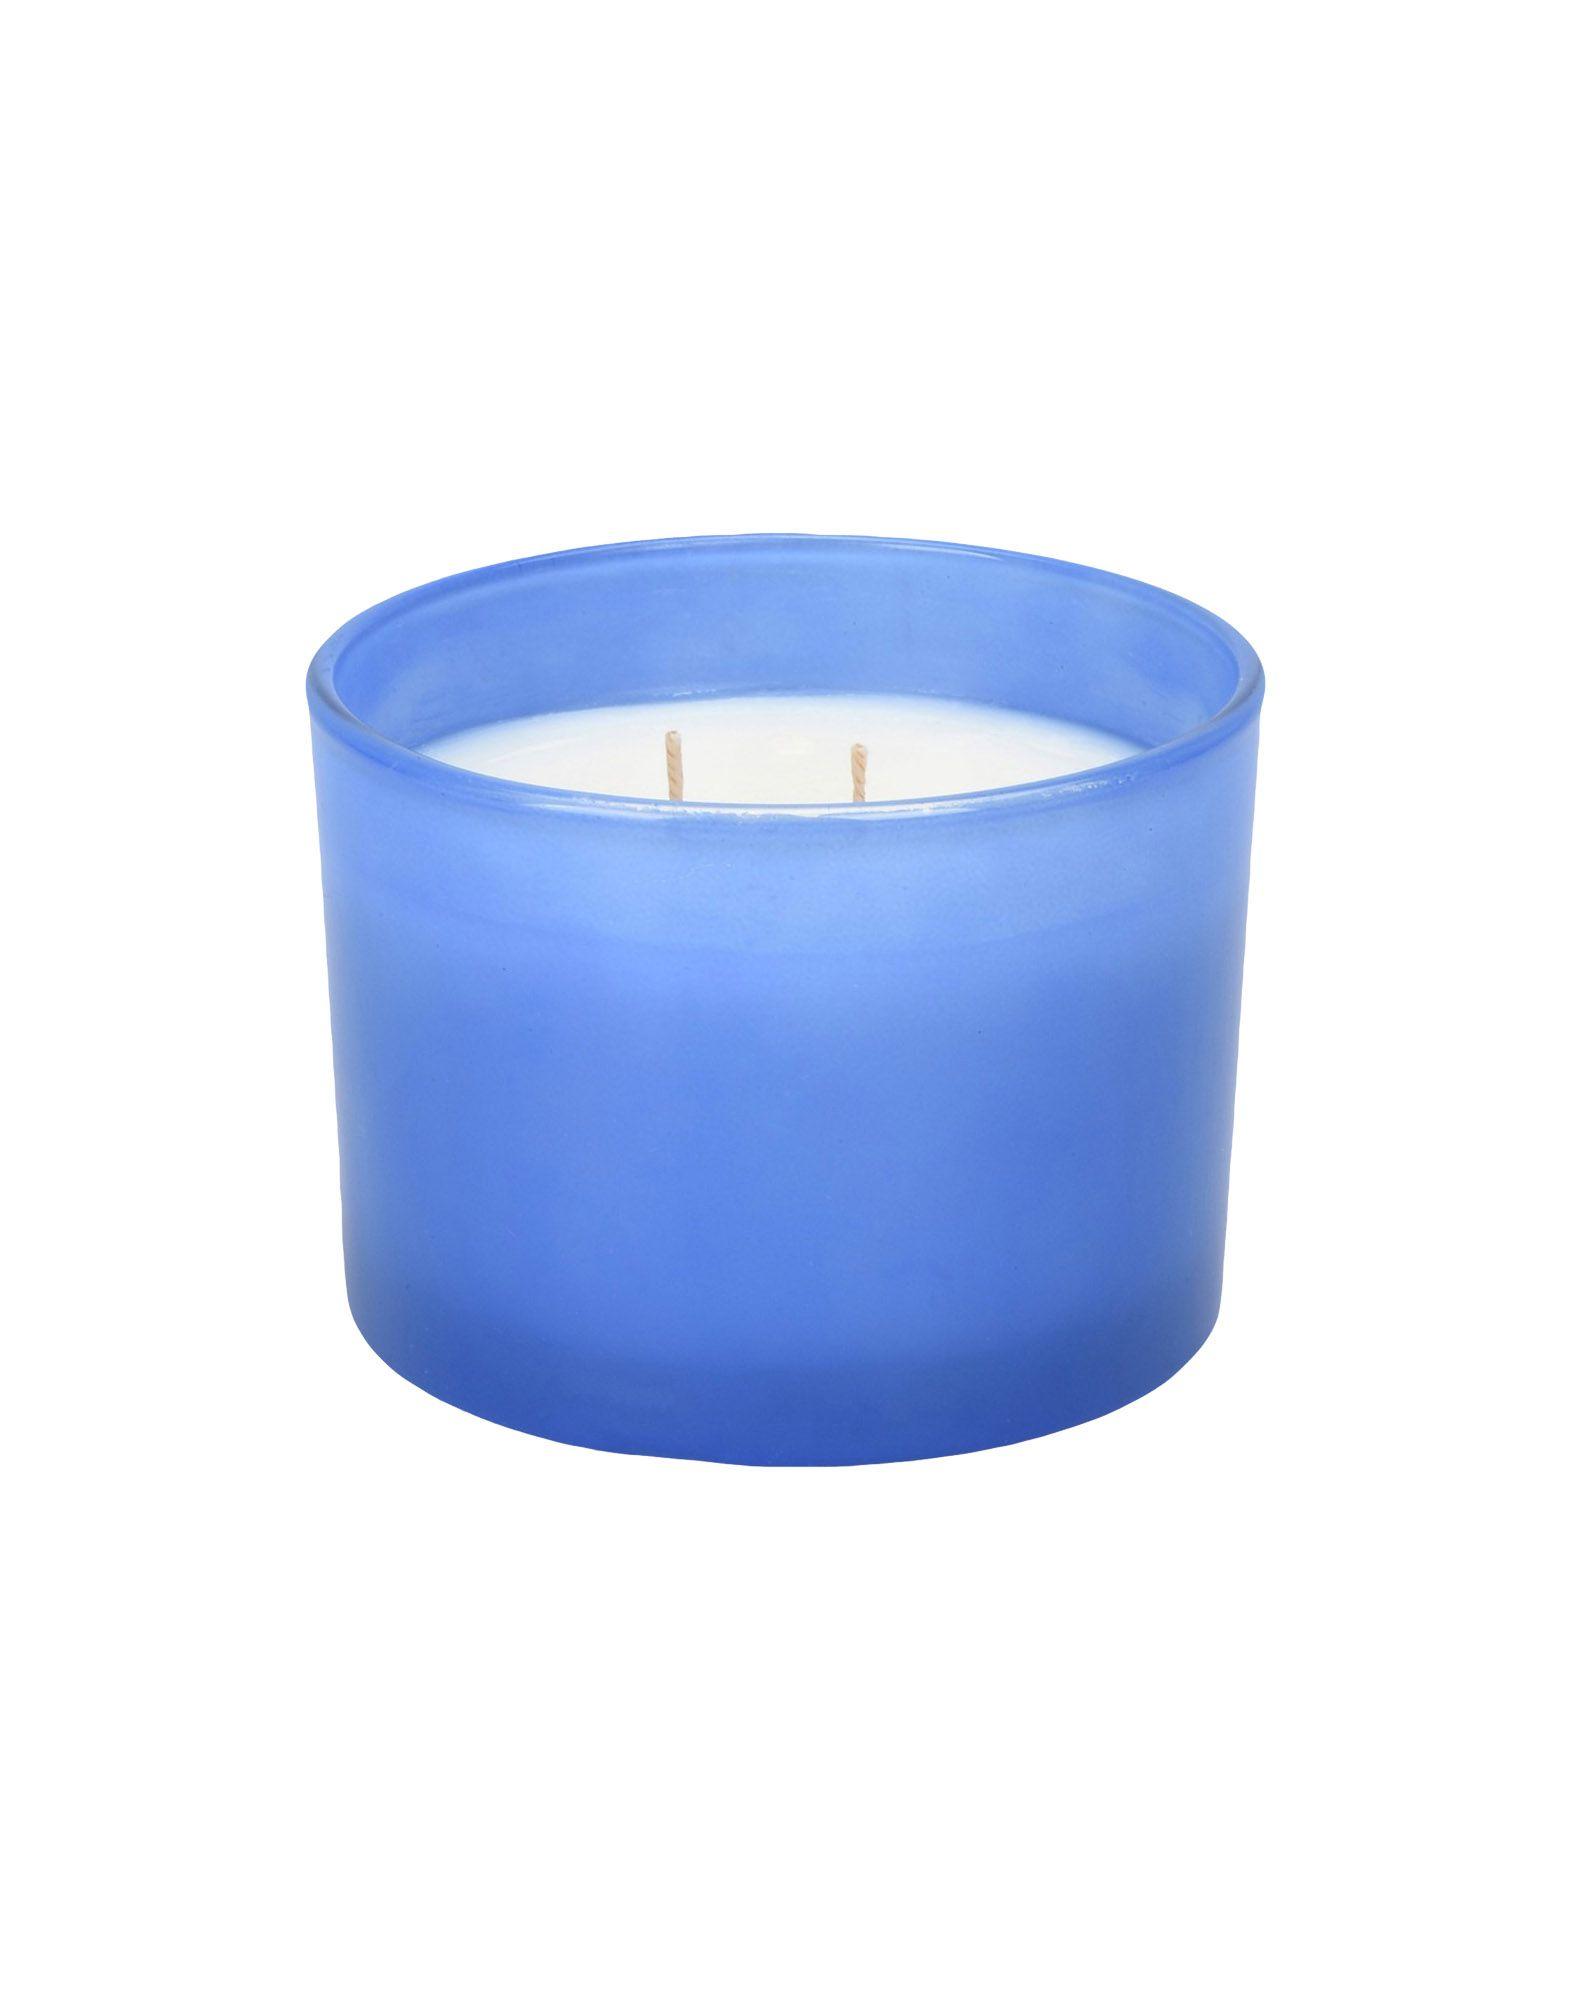 YOOX.COM(ユークス)《セール開催中》ODEME メンズ キャンドル ブルー ナチュラルワックス CANDLE - WATERMILL